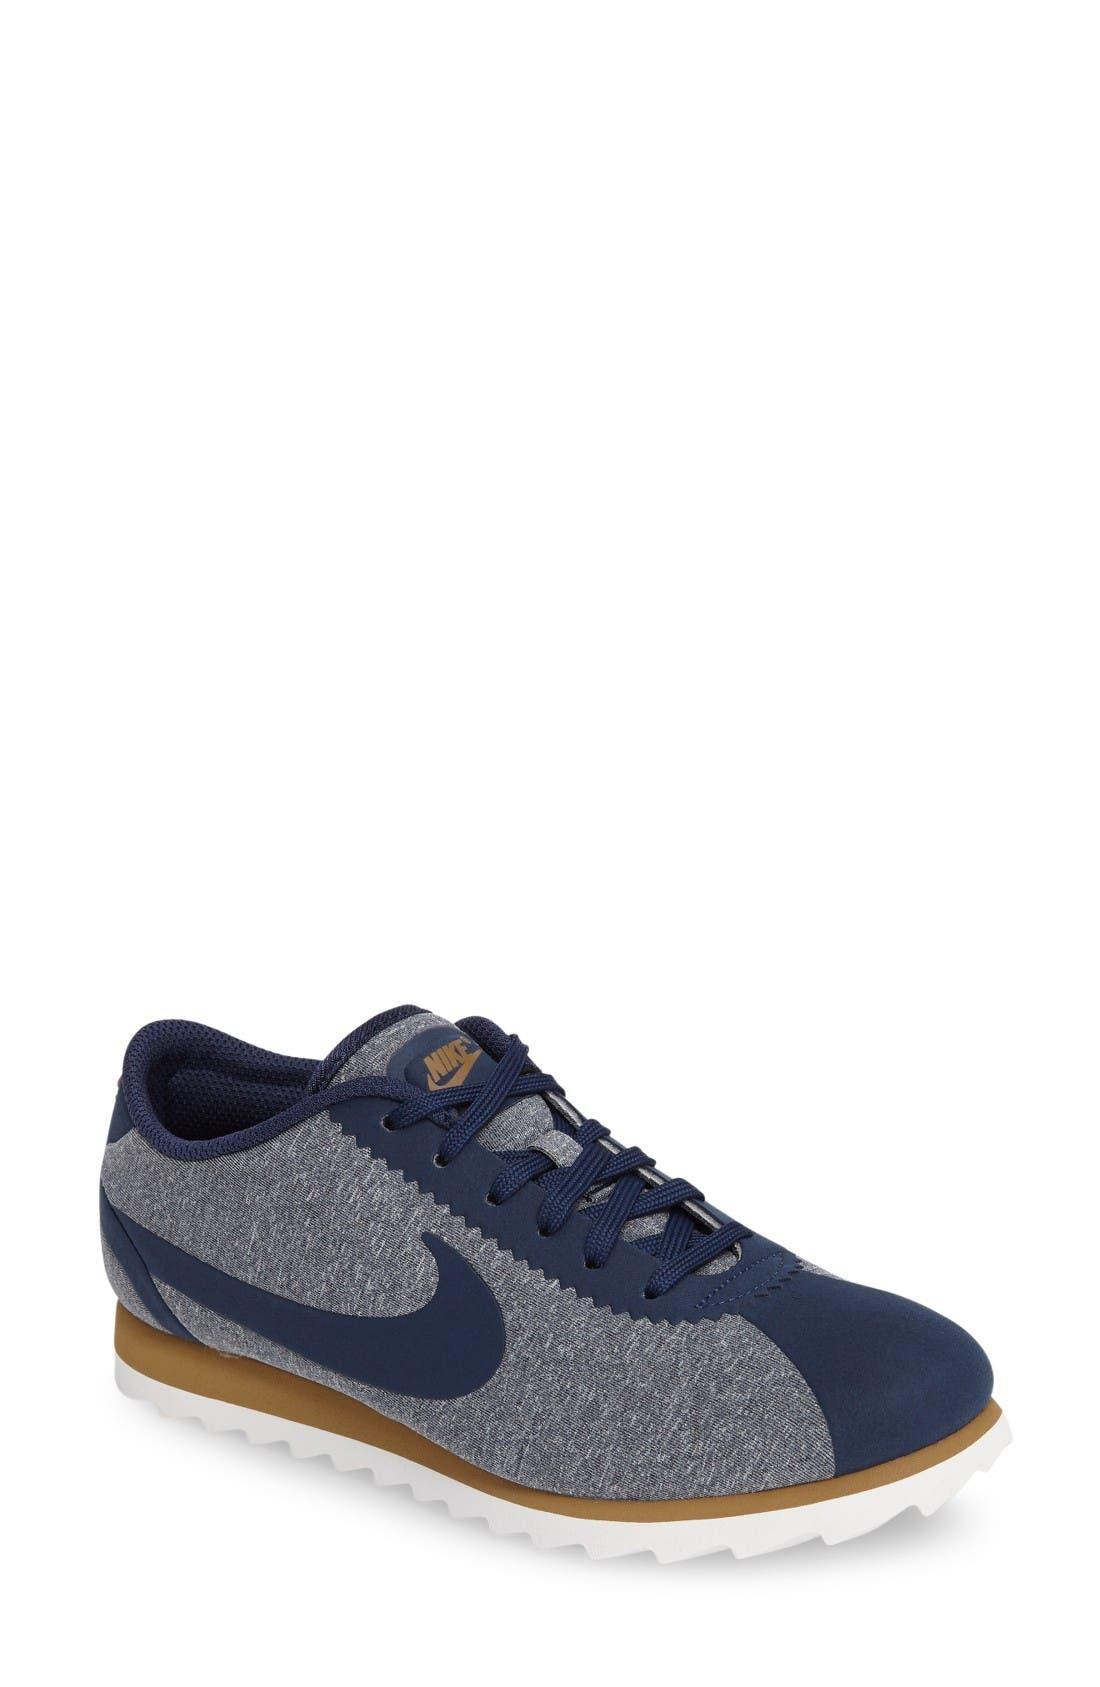 Alternate Image 1 Selected - Nike Cortez Ultra SE Sneaker (Women)